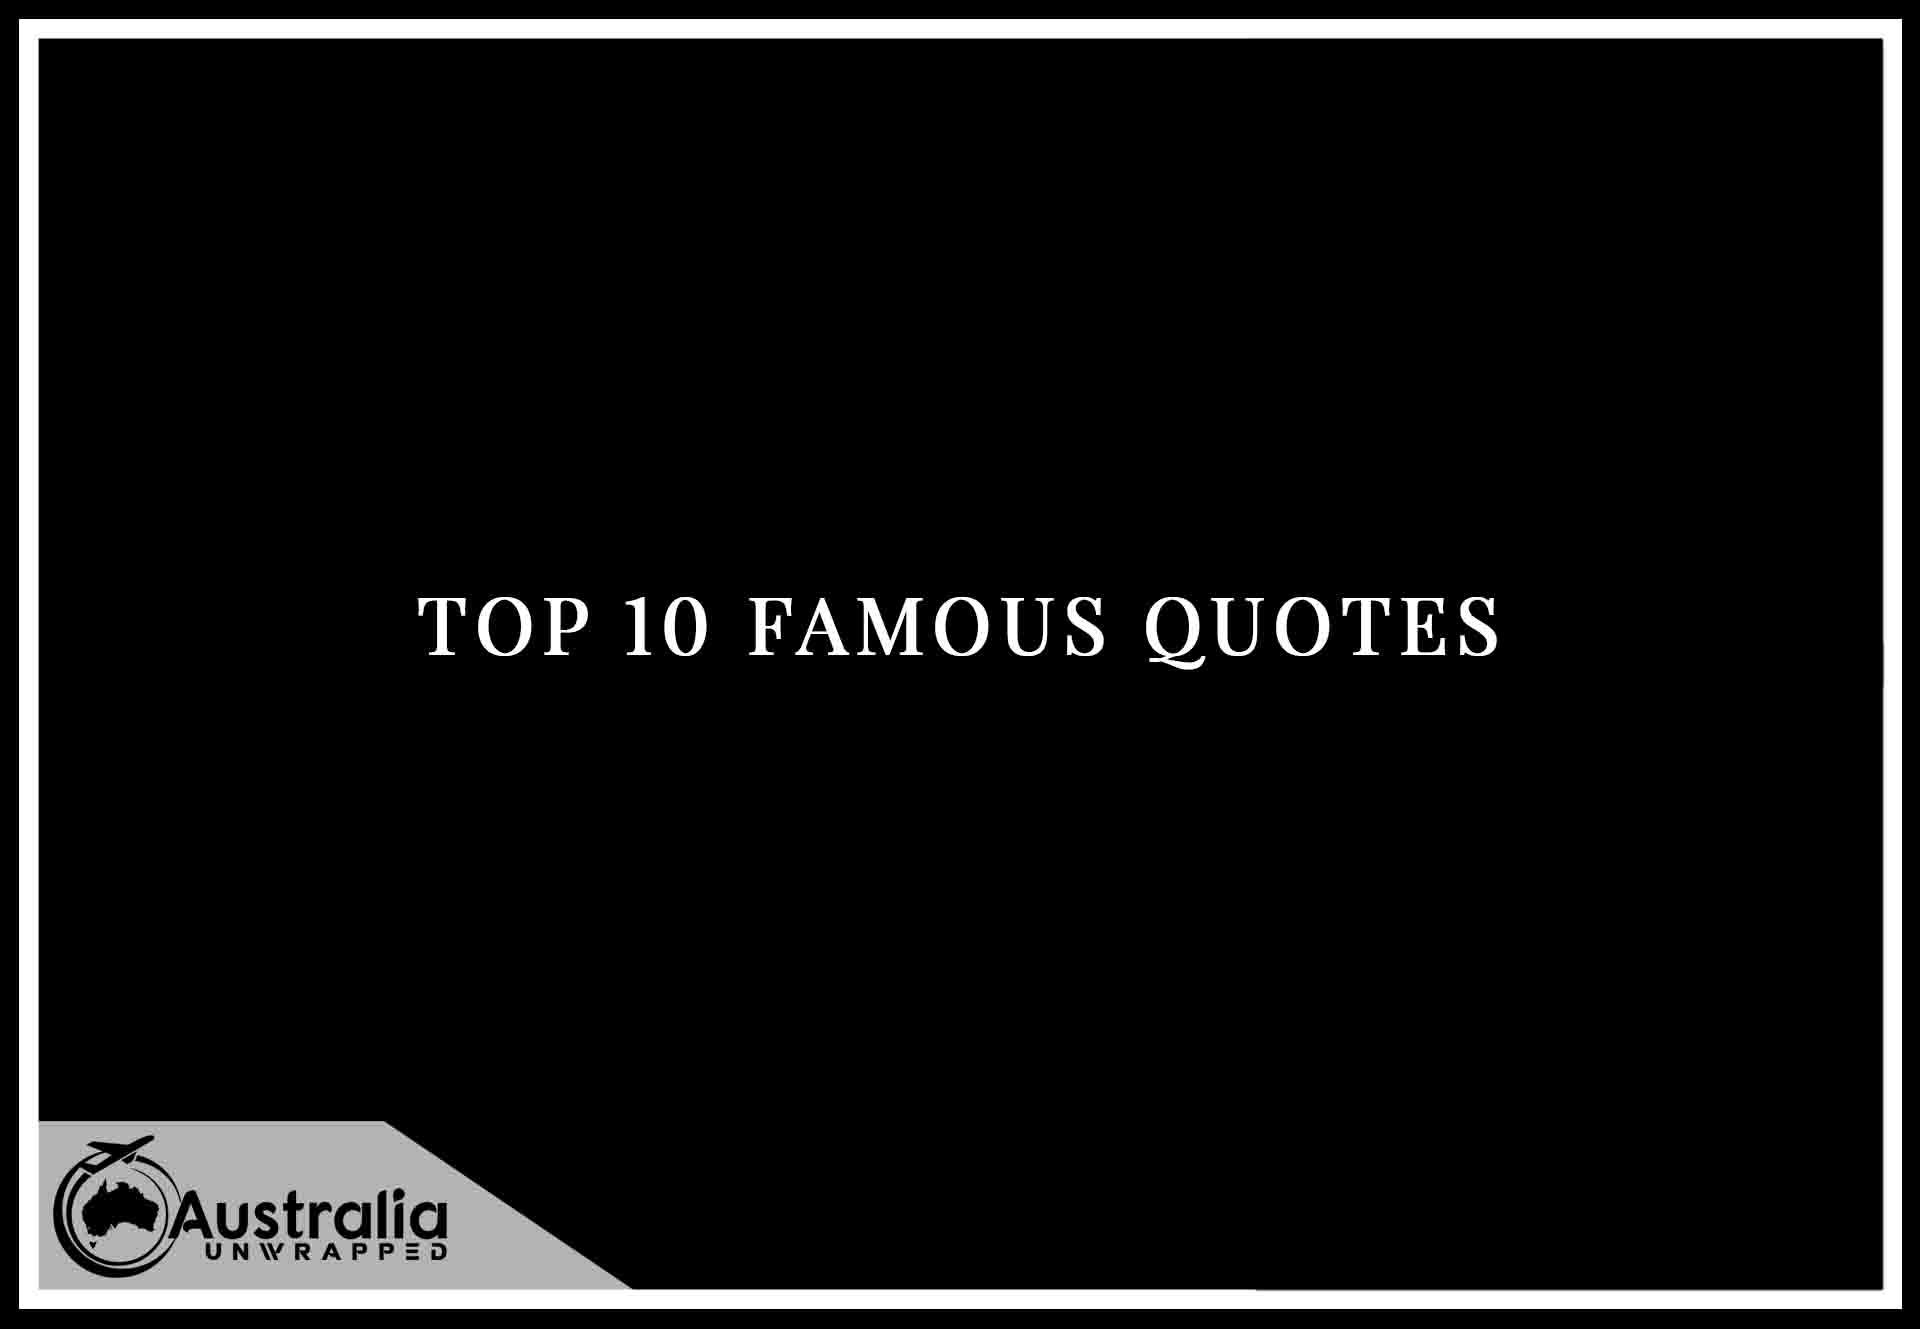 Top 10 Famous Quotes by Author Ray Bradbury